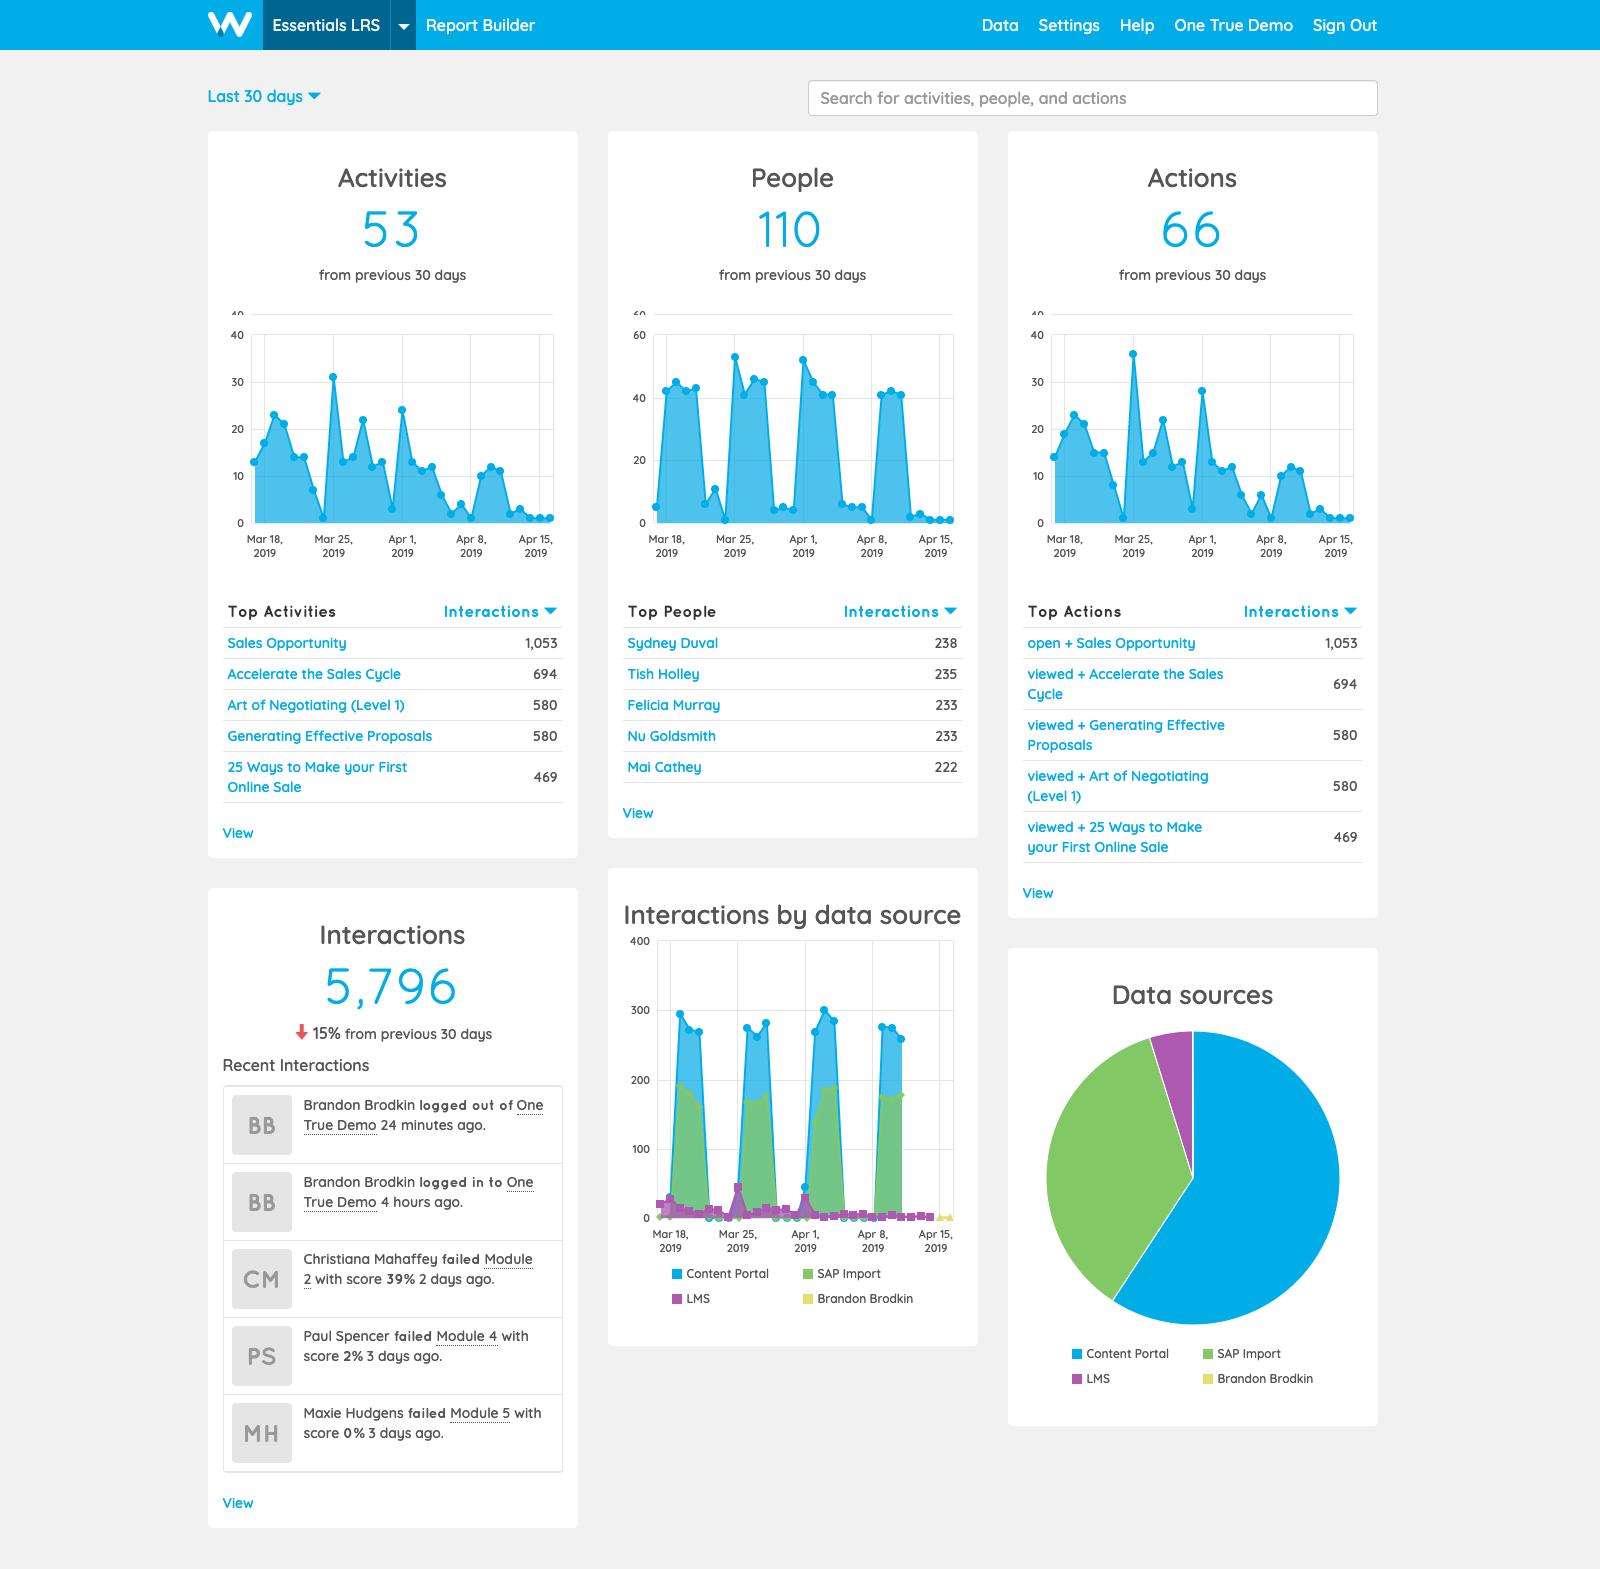 Screenshot of Watershed Essentials LRS